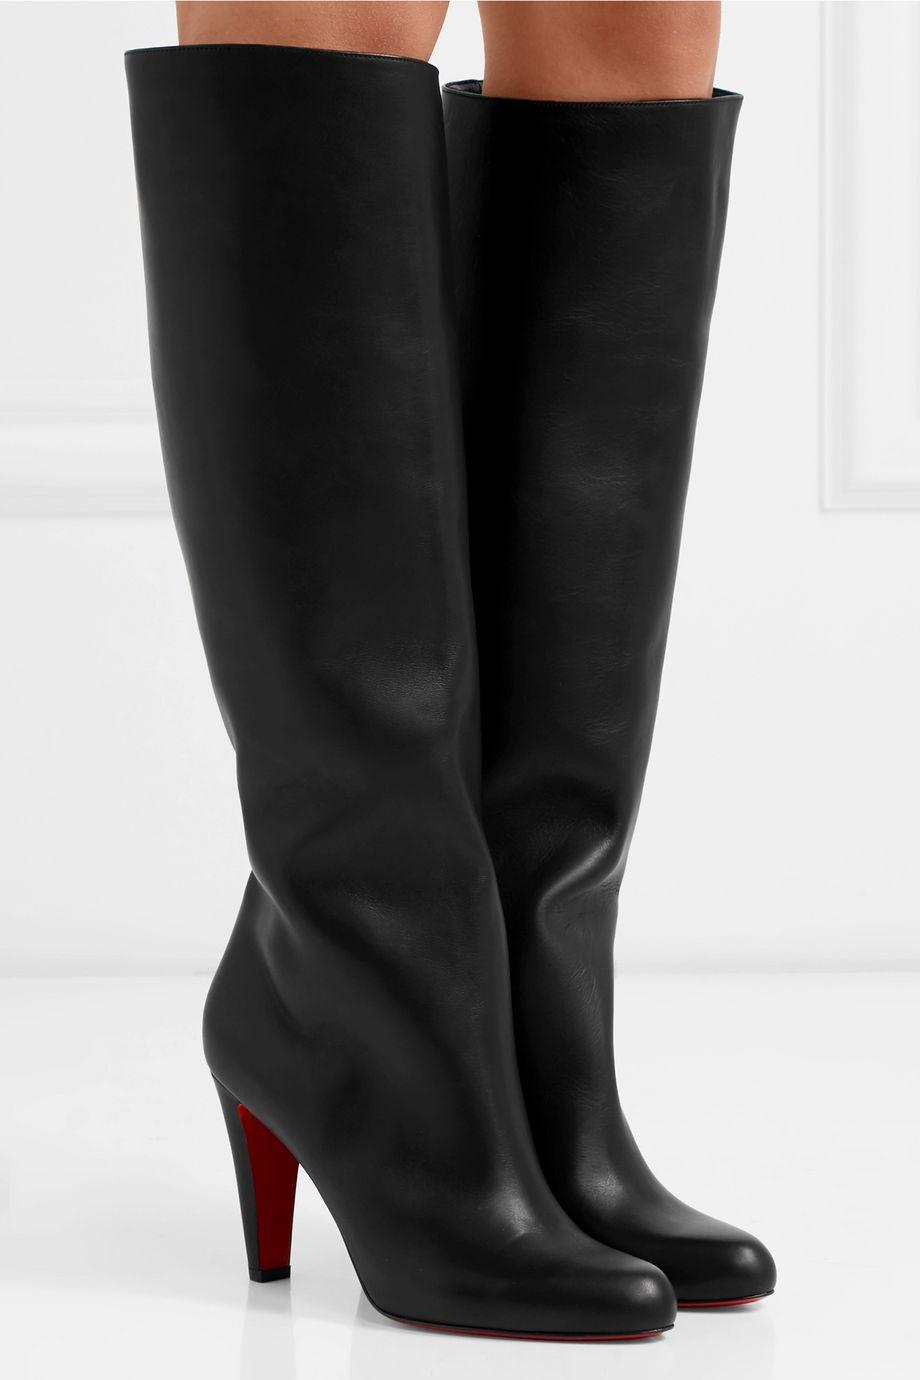 Christian Louboutin Marmara 85 leather knee boots